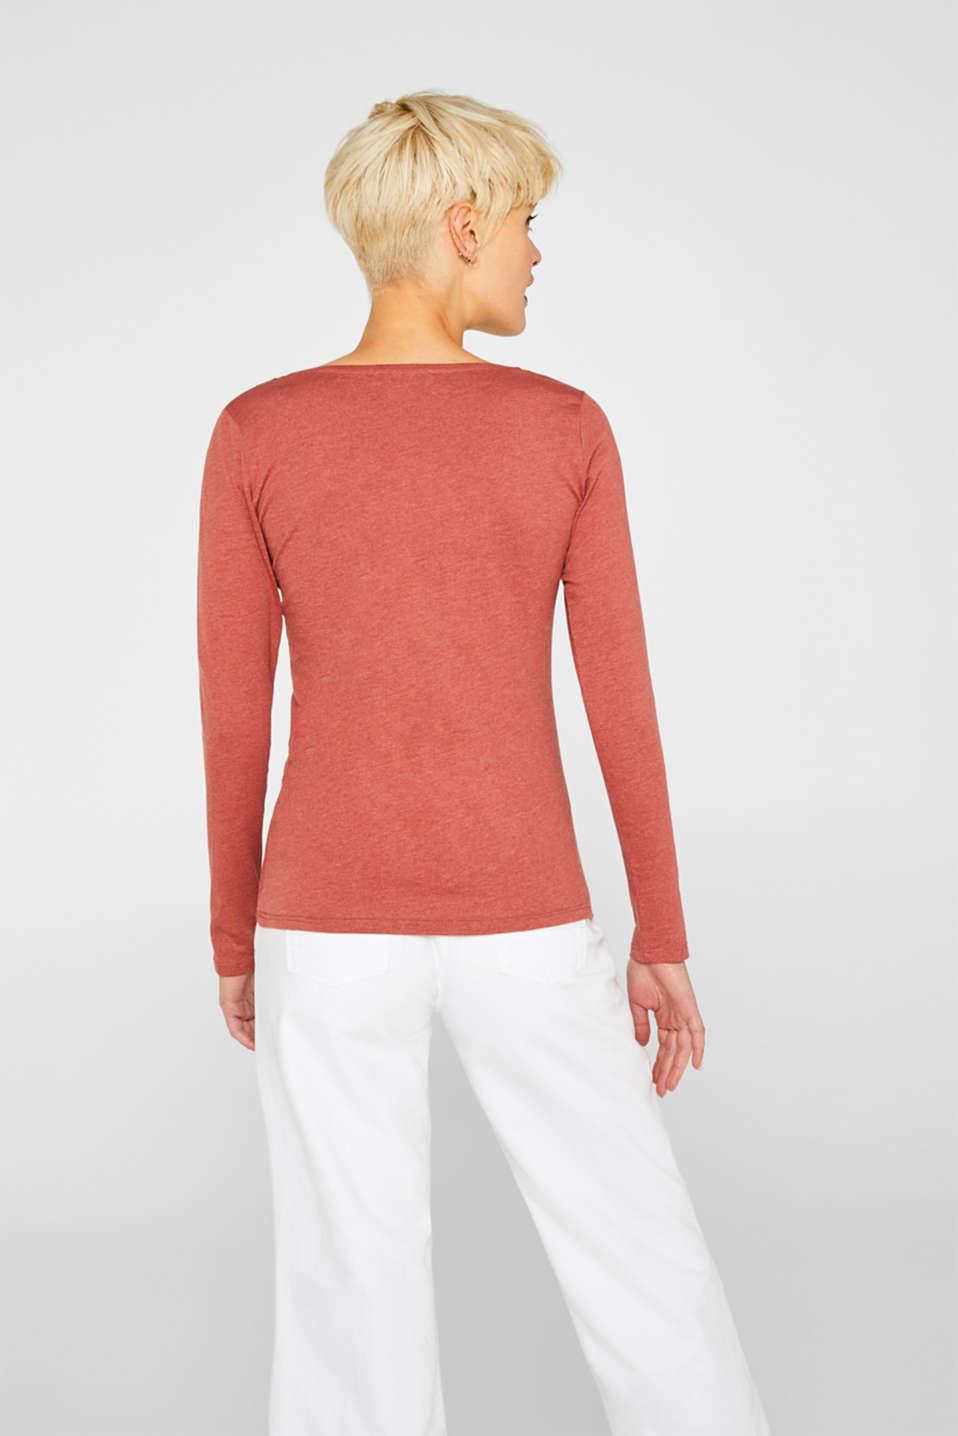 Melange long sleeve top with organic cotton, RUST ORANGE 4, detail image number 3